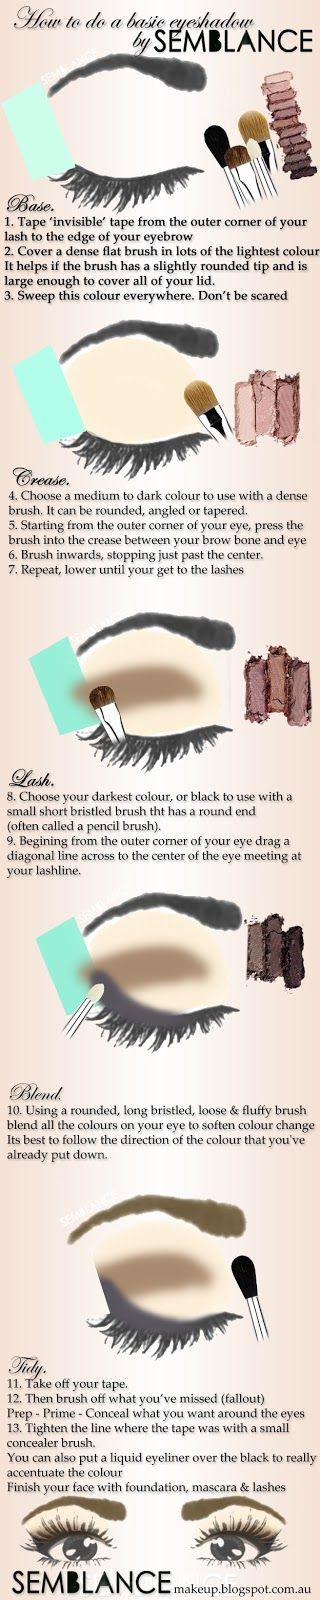 Make Up Tips And Tricks Diagram Eyeshadow And Makeup